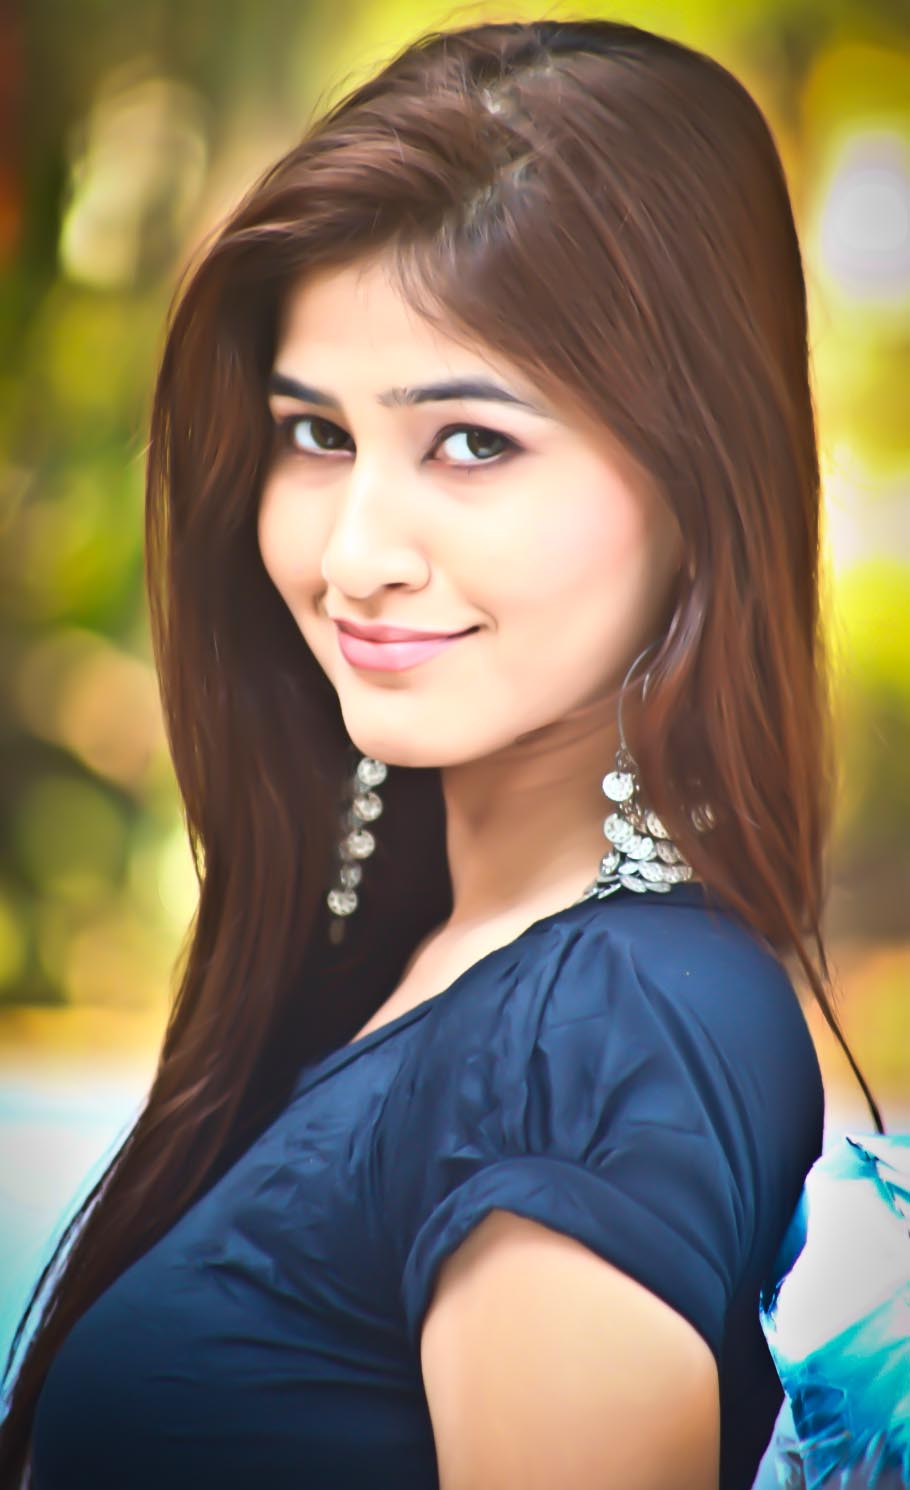 Dir V K Sarin Indo Forner Star Casting Sharan Kumar Lead Hero Heroin Nargies Aman Verma And More Market Artist Required Female